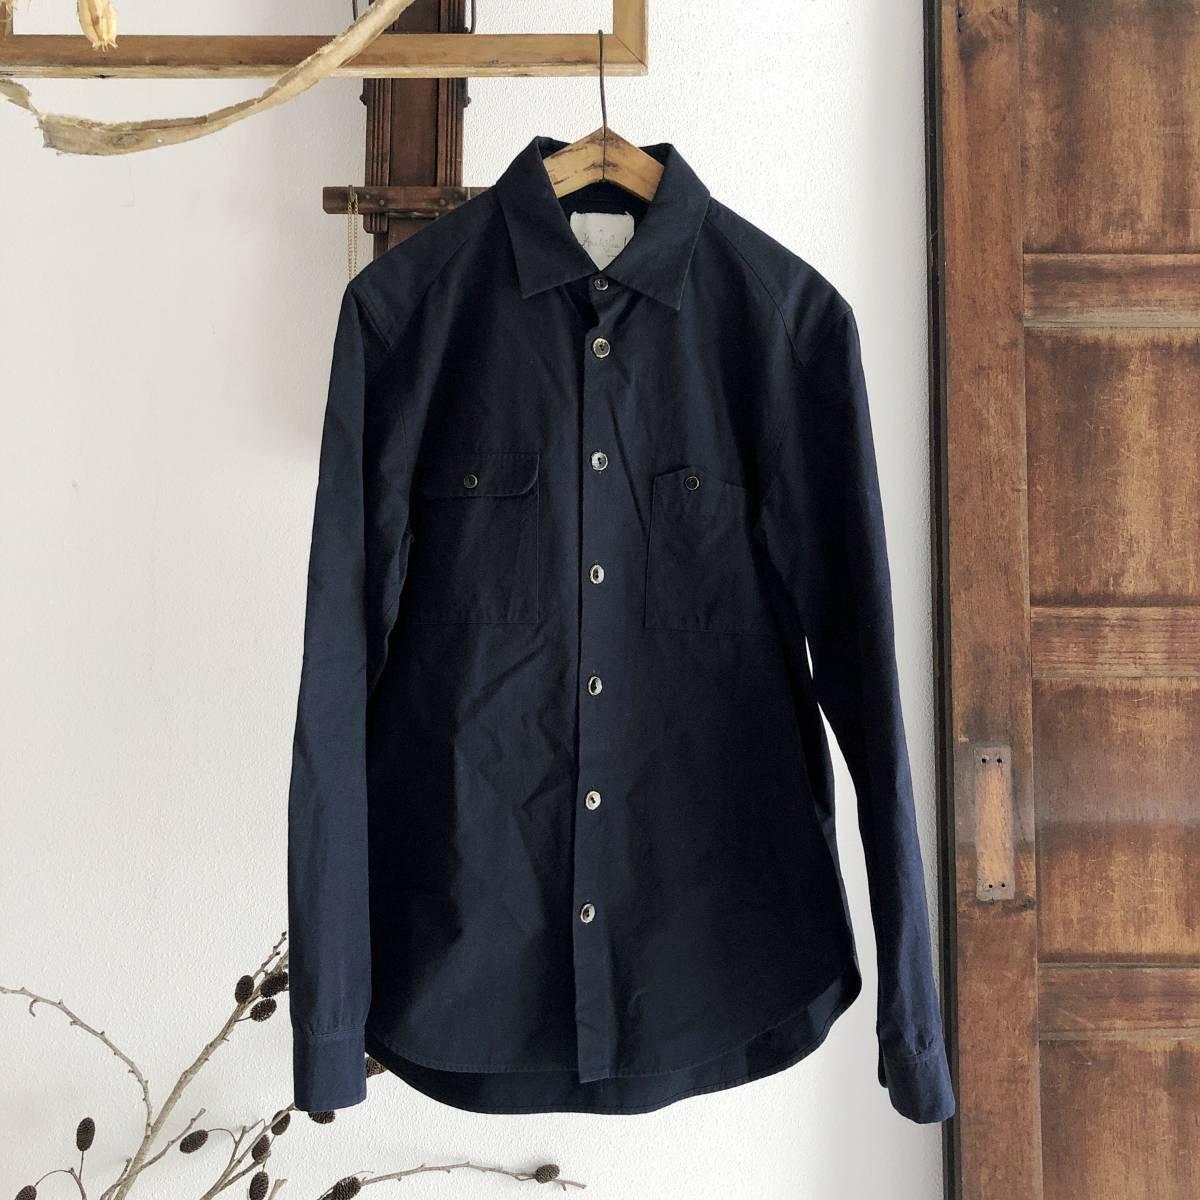 Araki Yuu 17AW Double pocket shirt jacket Nero_navy/Black button SIZE1 アラキユウ/シャツ/ジャケット_画像1